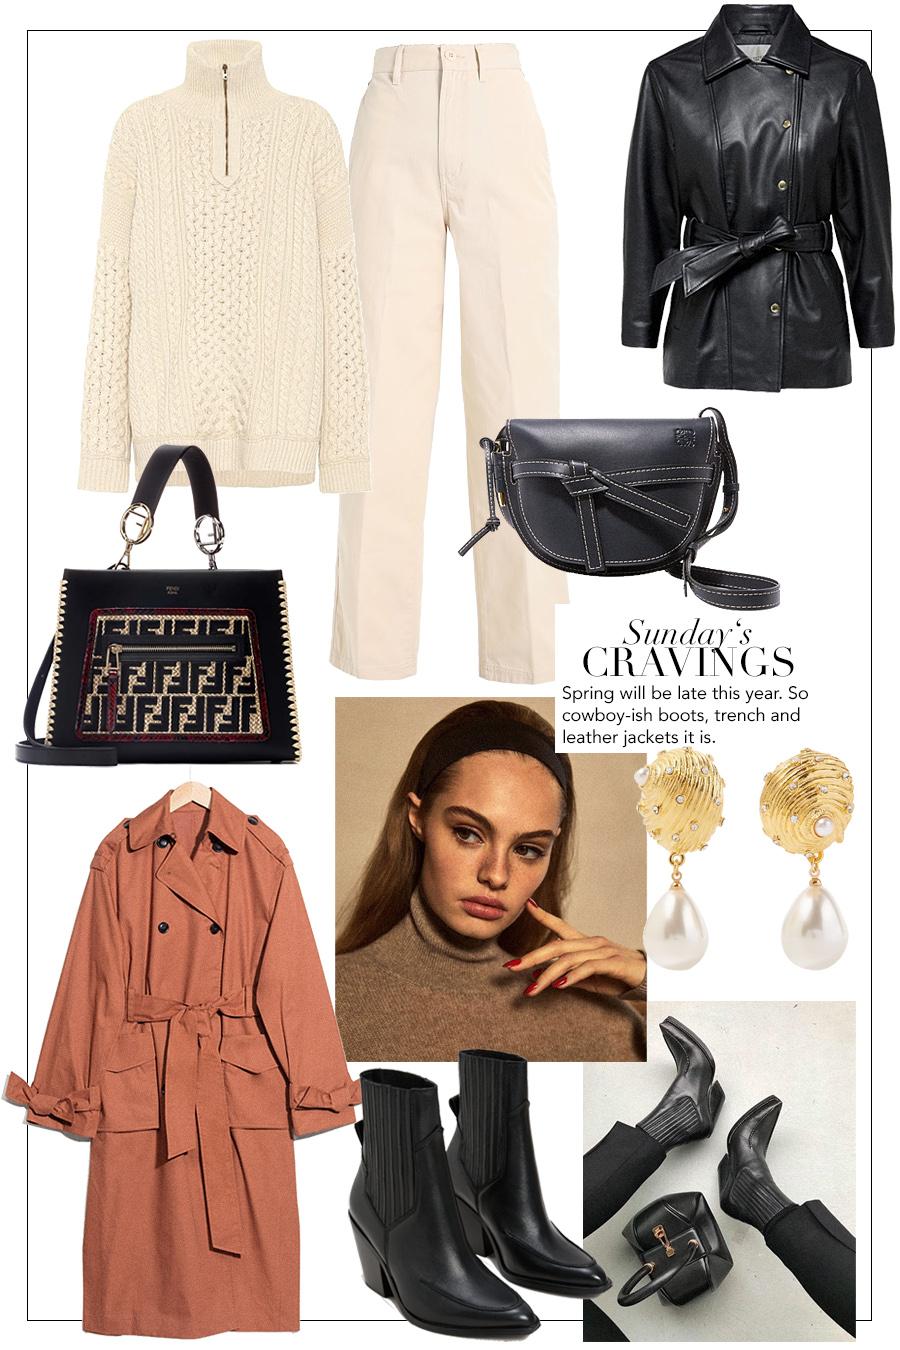 Loewe Gate bag, Fendi Runaway bag, Cowboy boots, Trenchcoat, Chloé Sweater, trousers, leather jacket, Earrings